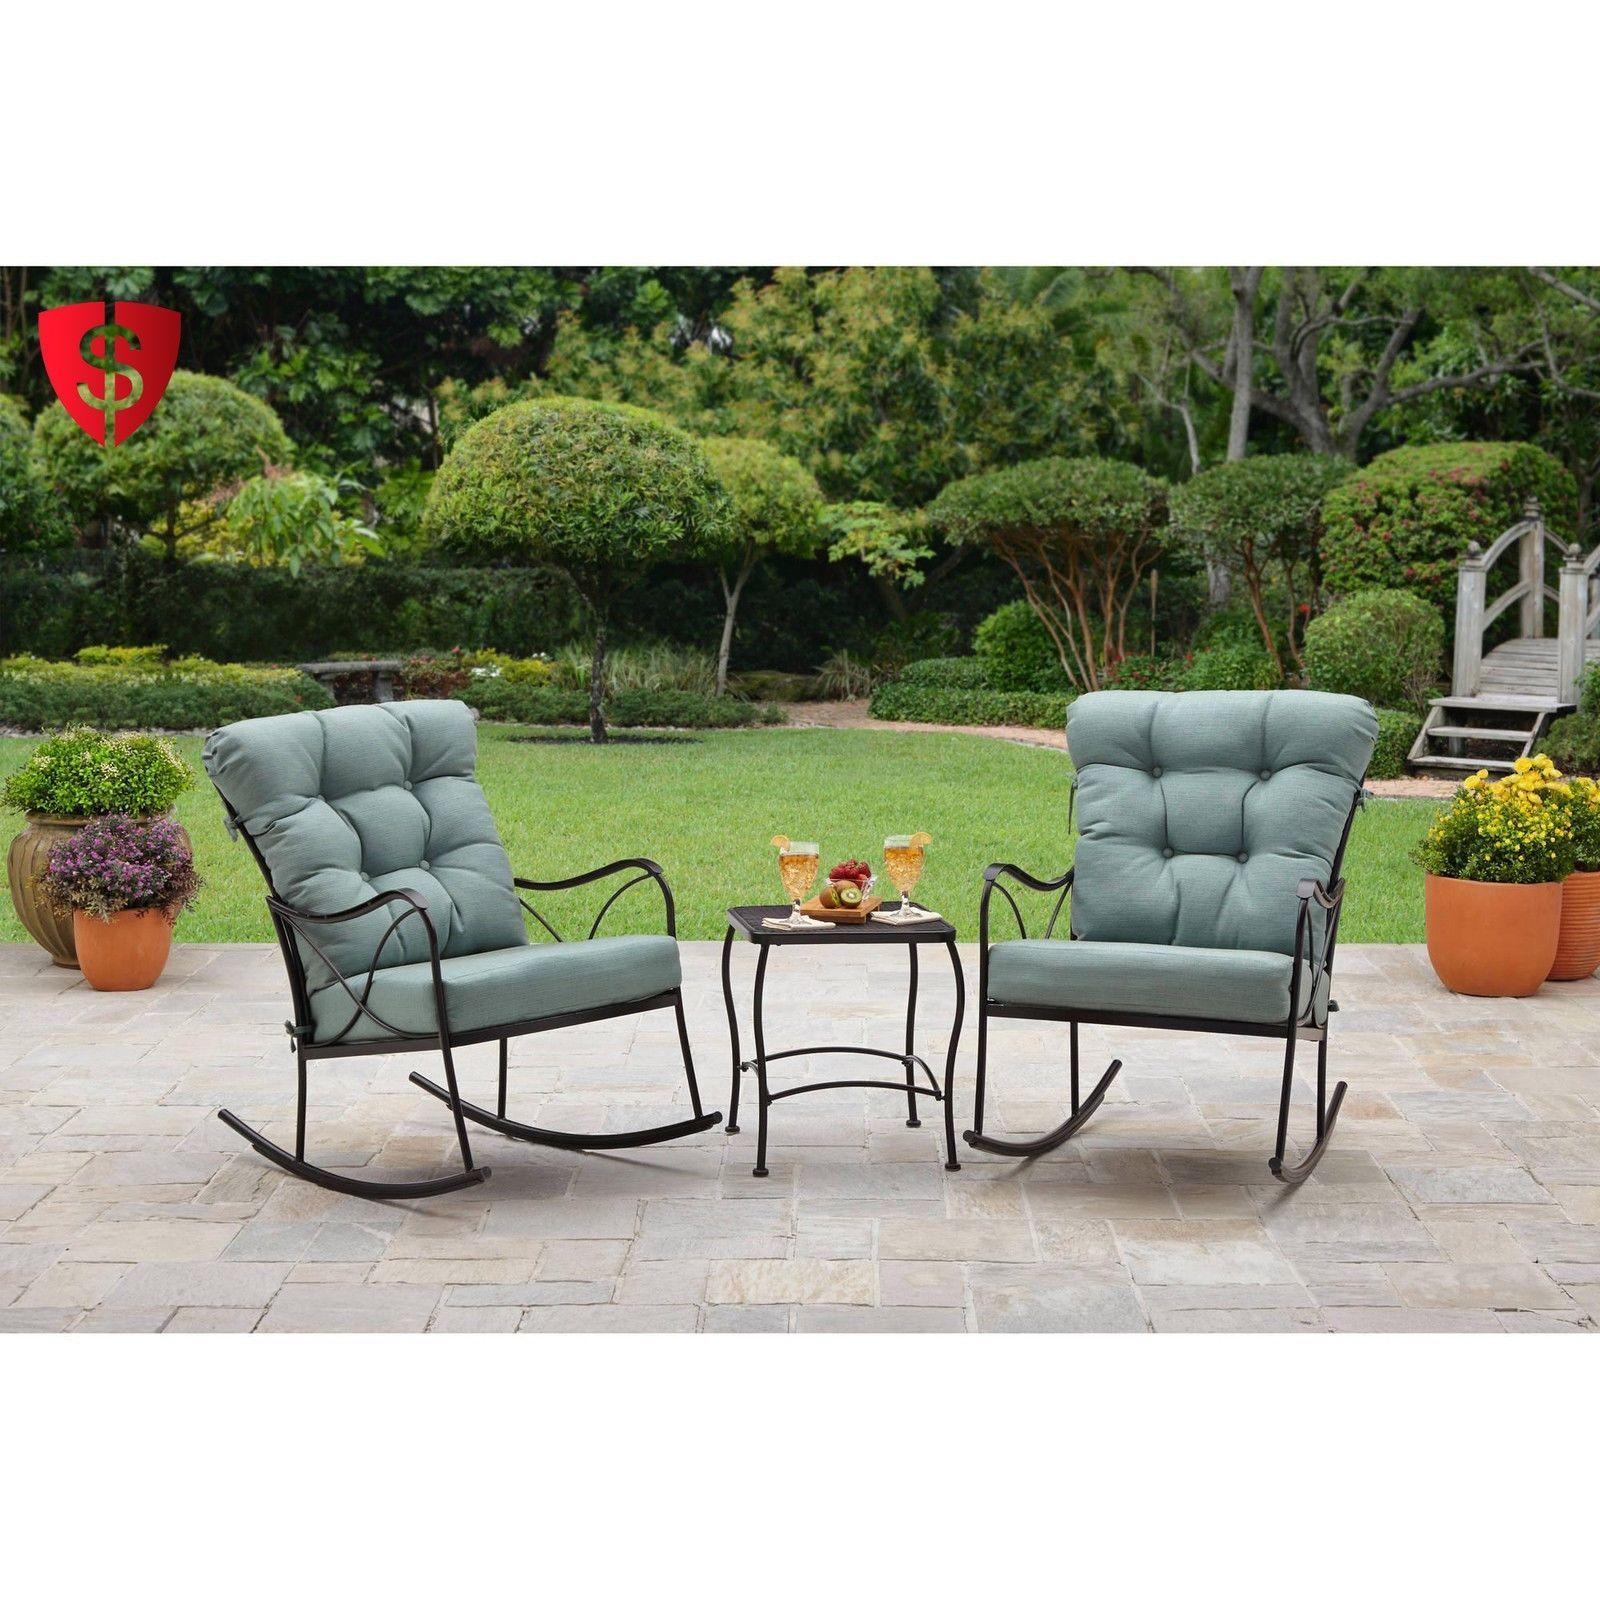 3 Piece Bistro Set Furniture Patio Table Outdoor Garden Yard 2